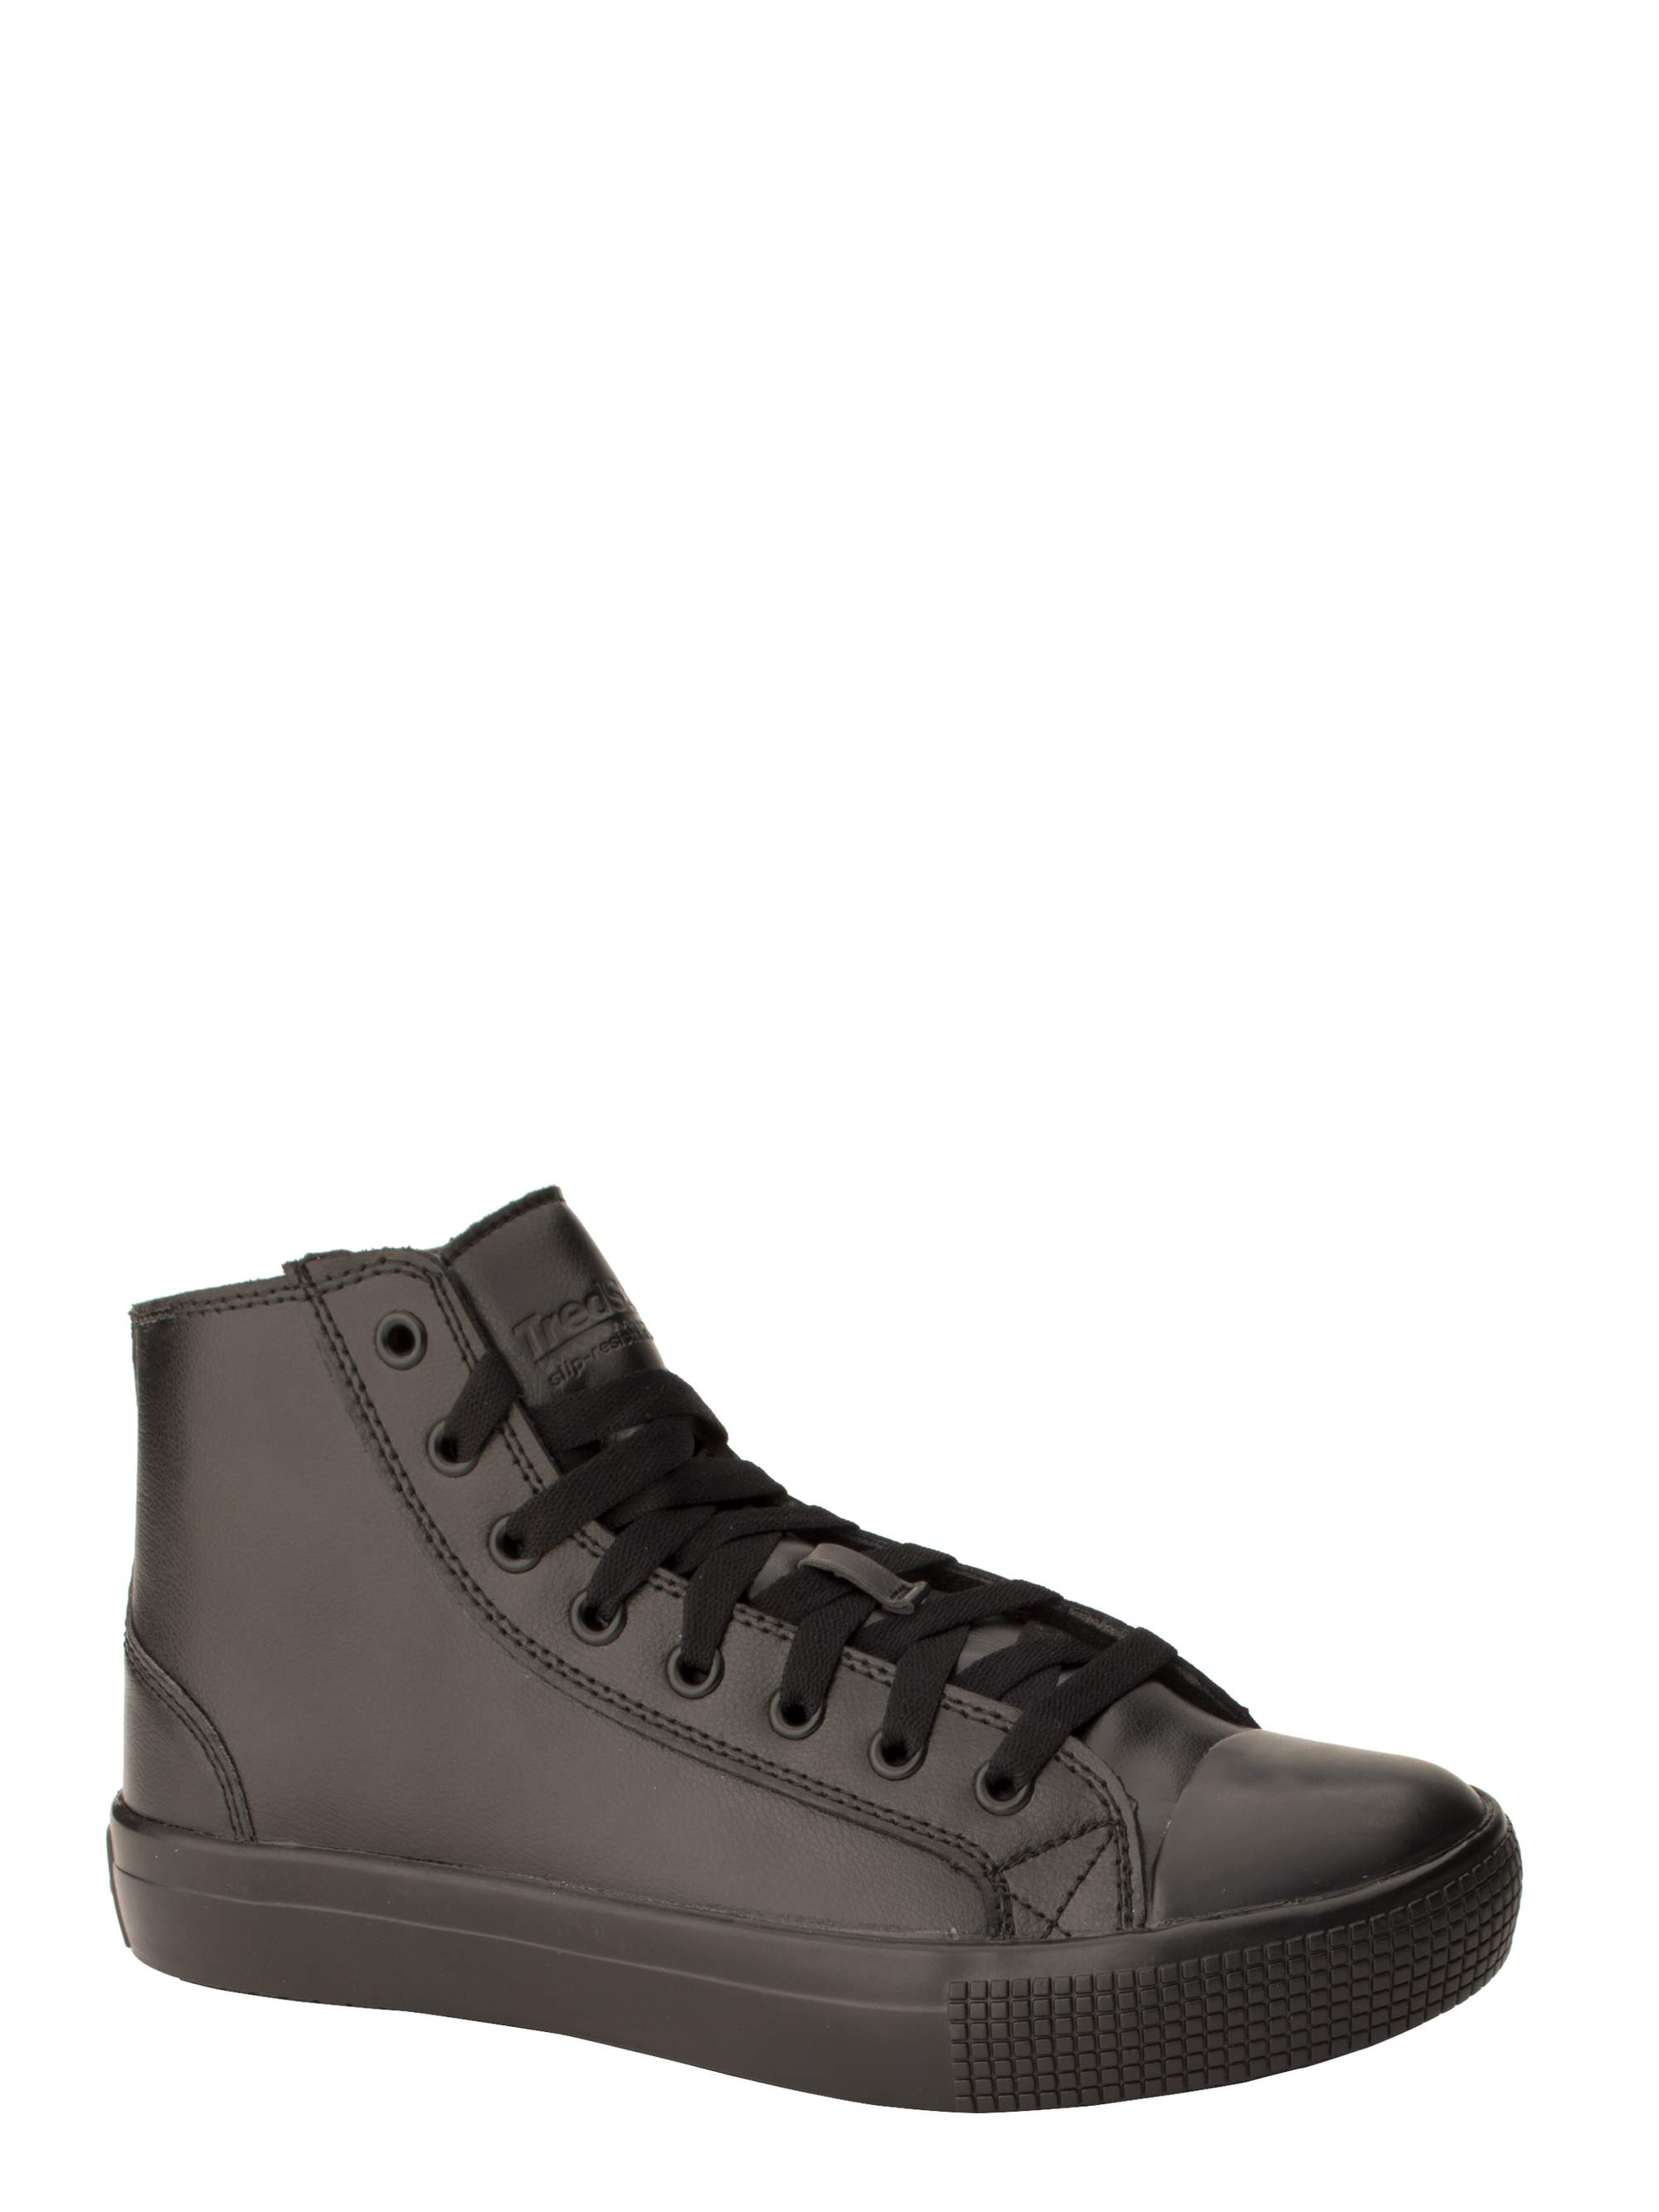 Tredsafe Unisex Kitch Hi Top Slip-Resistant Work Shoe by HYI